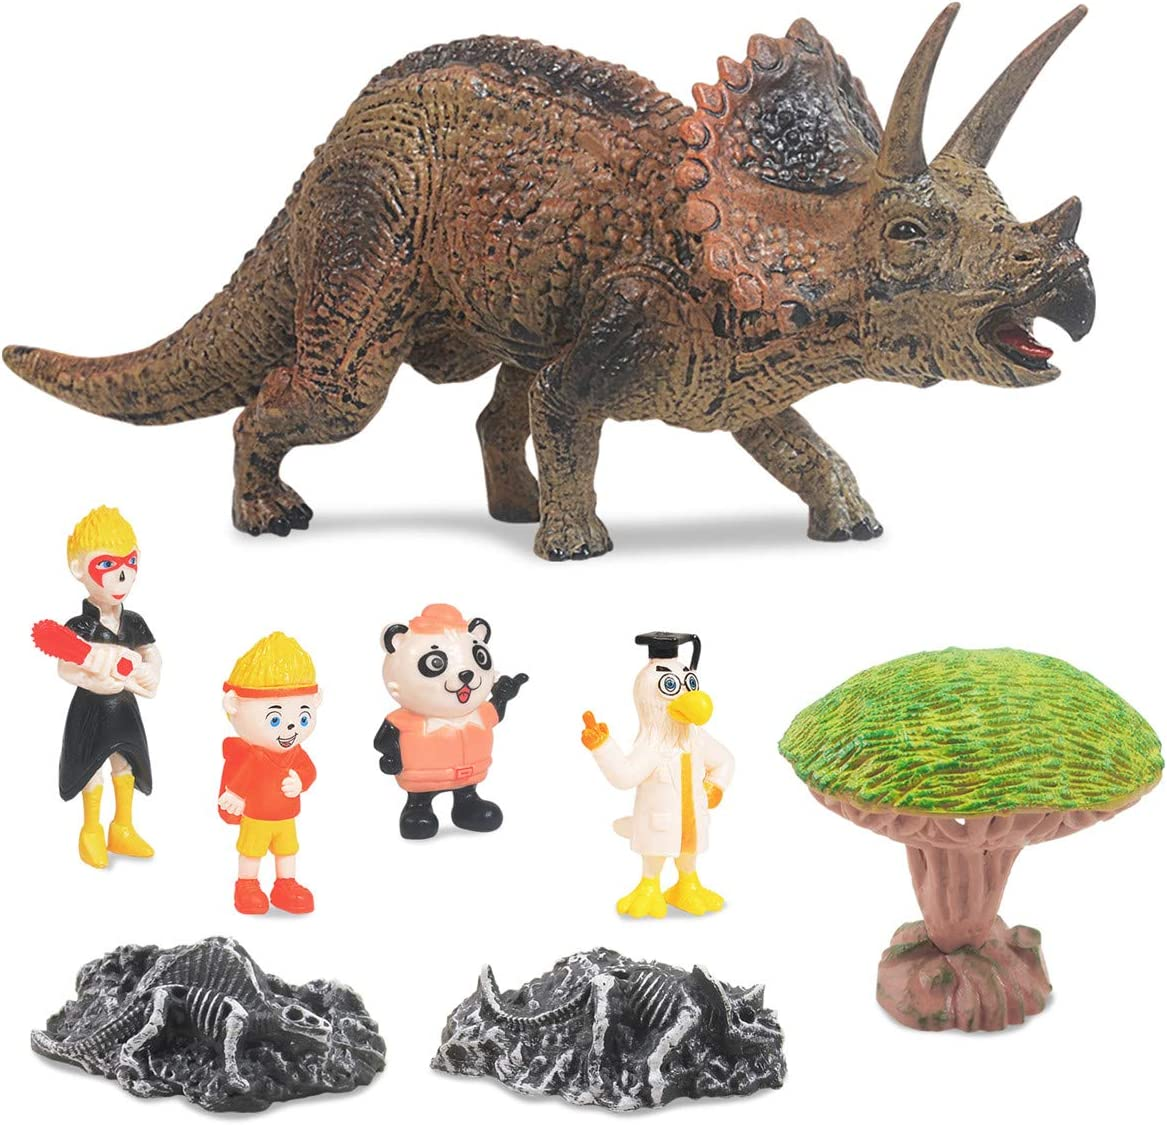 KOMI Dinosaur Max 42% OFF Toys Department store Set for Boys Pcs Triceratop Kit Dino Girls 8